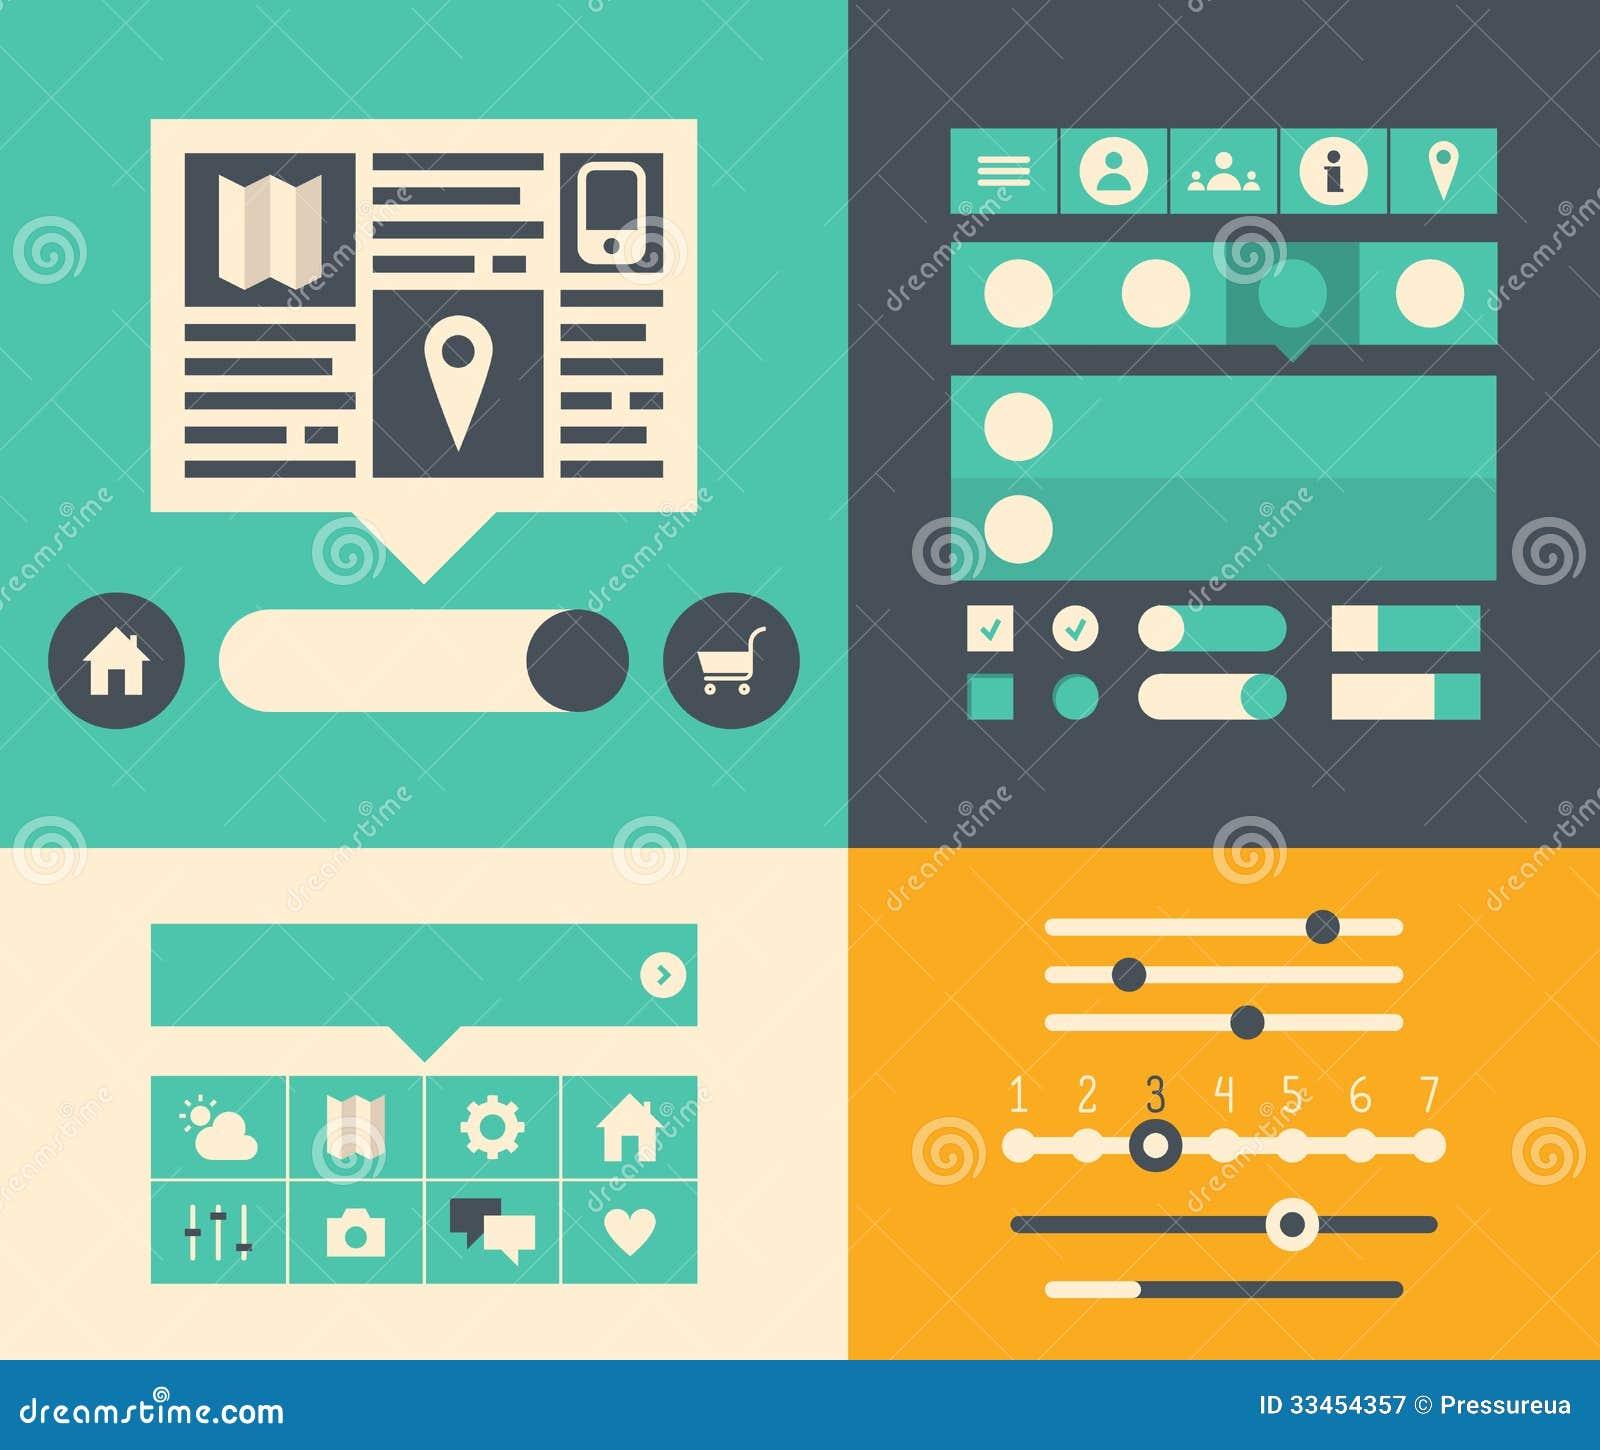 Free User Interface Design Website